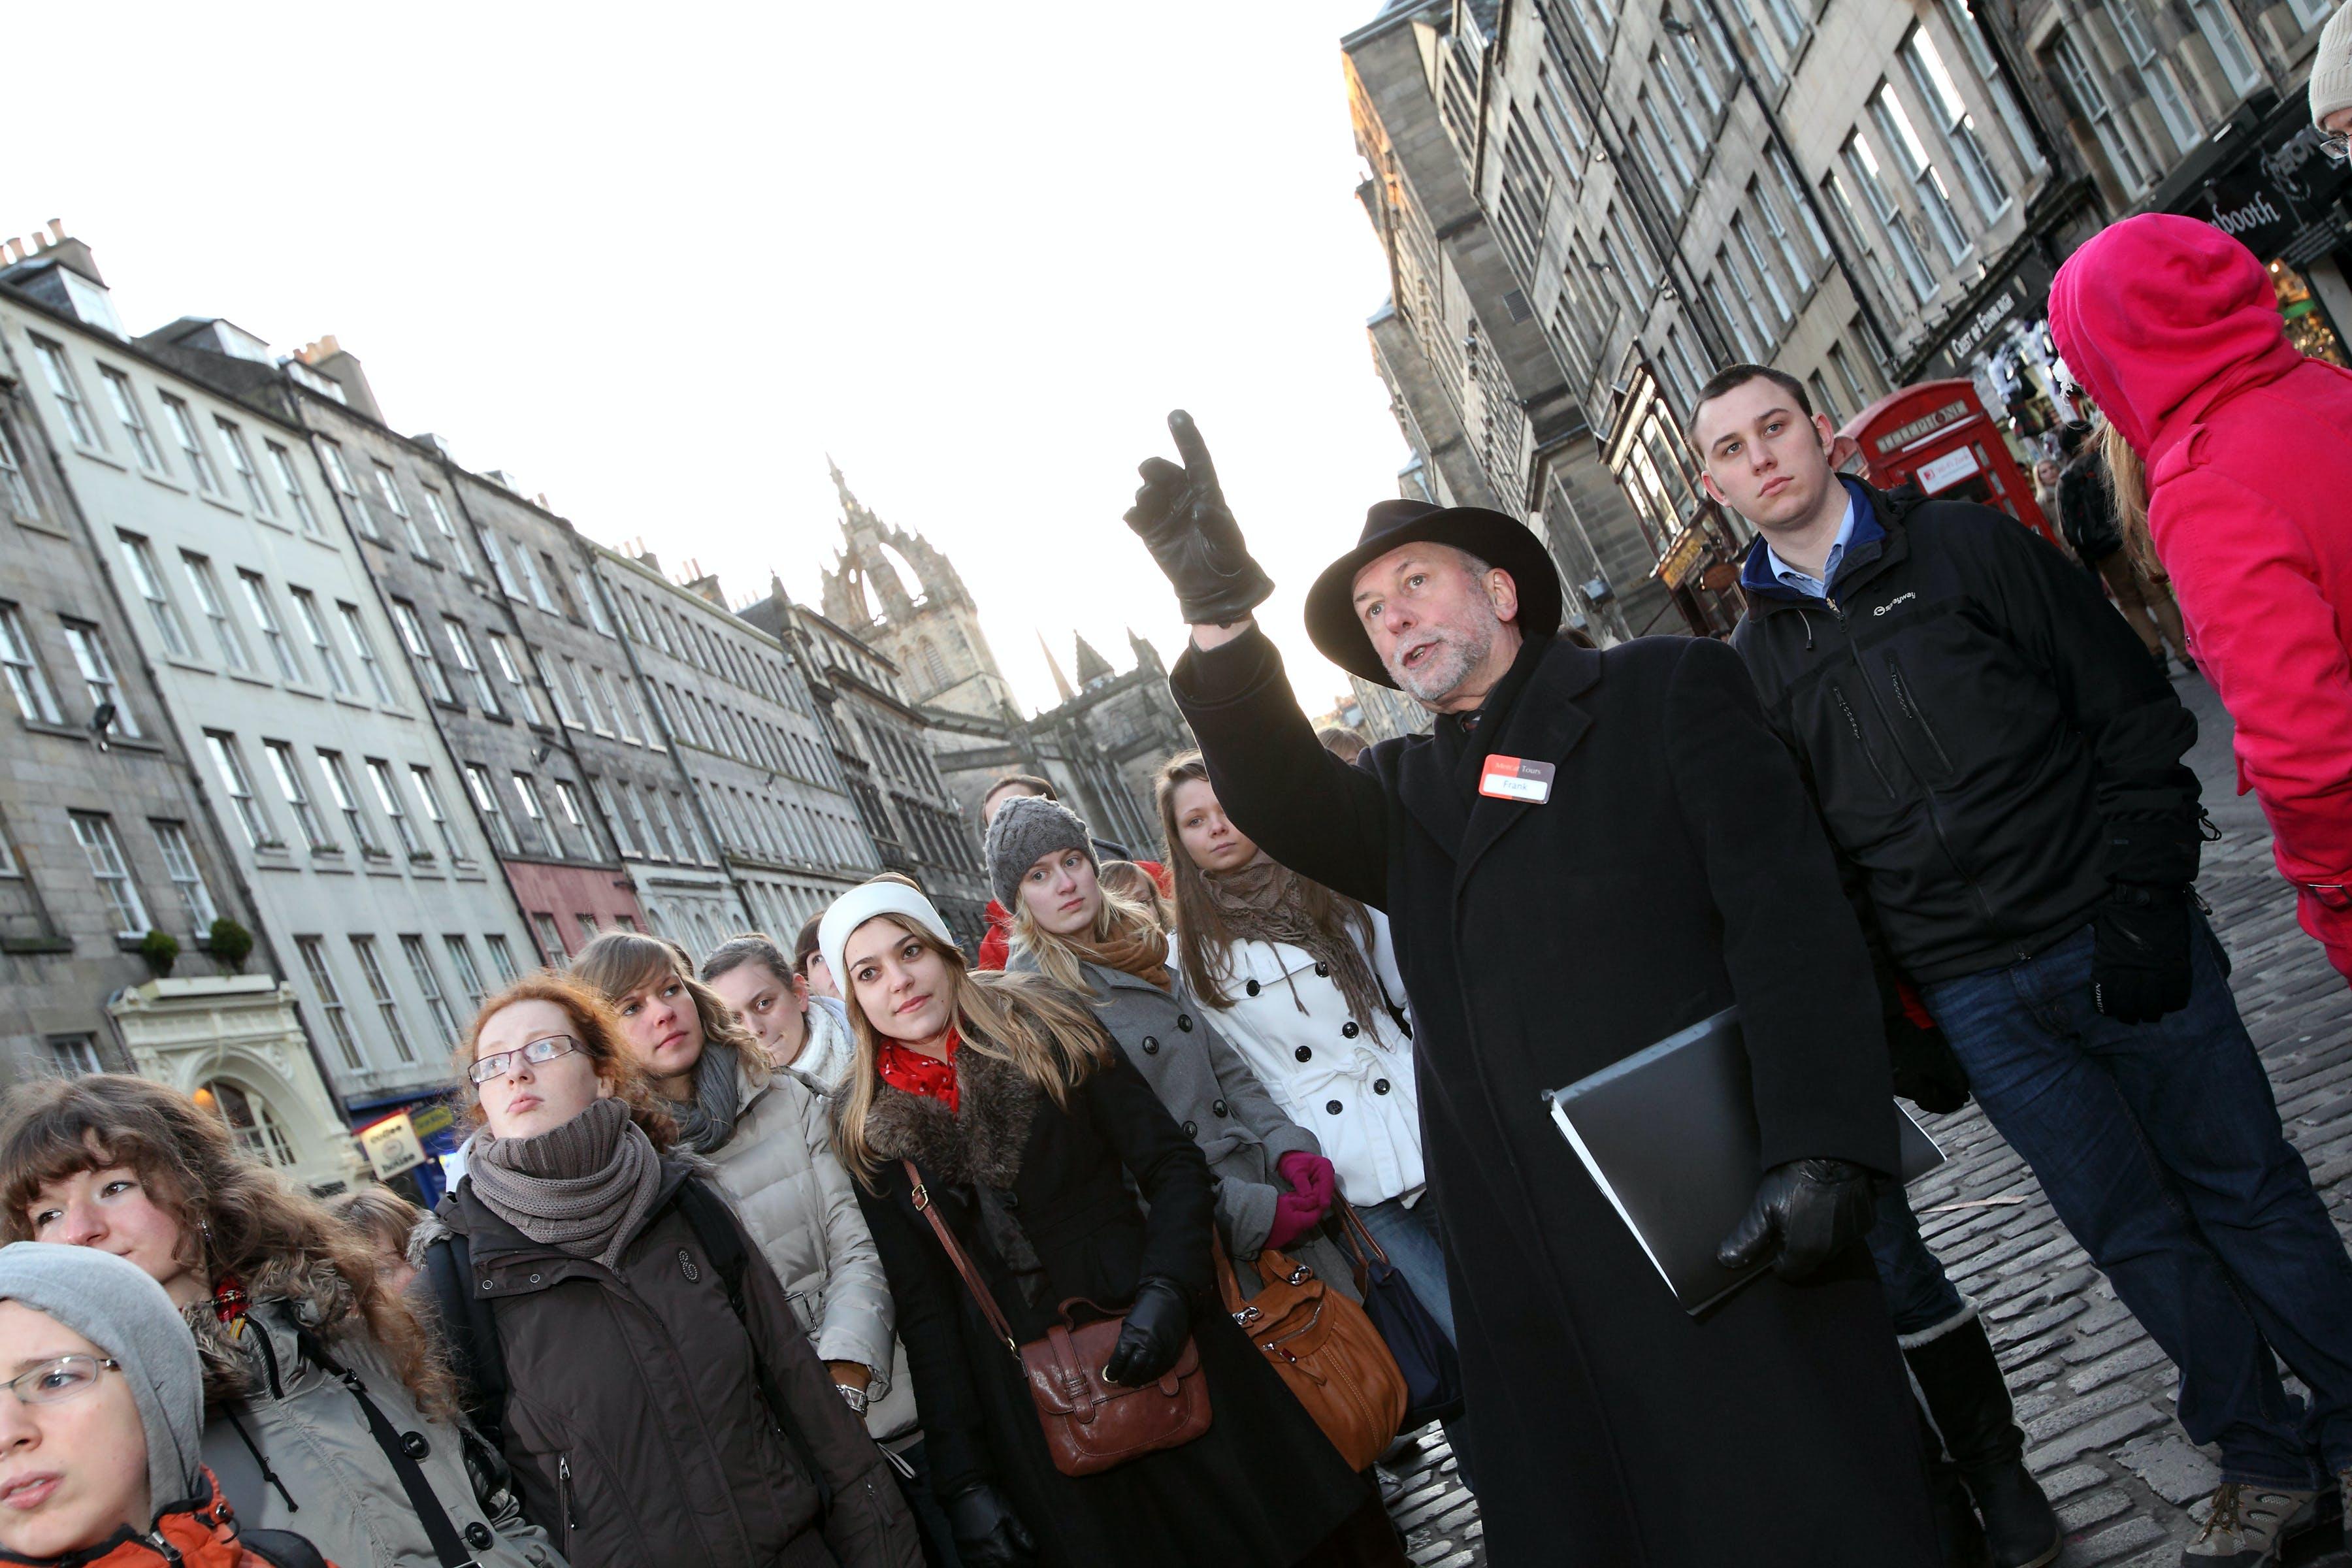 Edinburgh walking tour with optional Edinburgh Castle skip-the-line tickets and guide